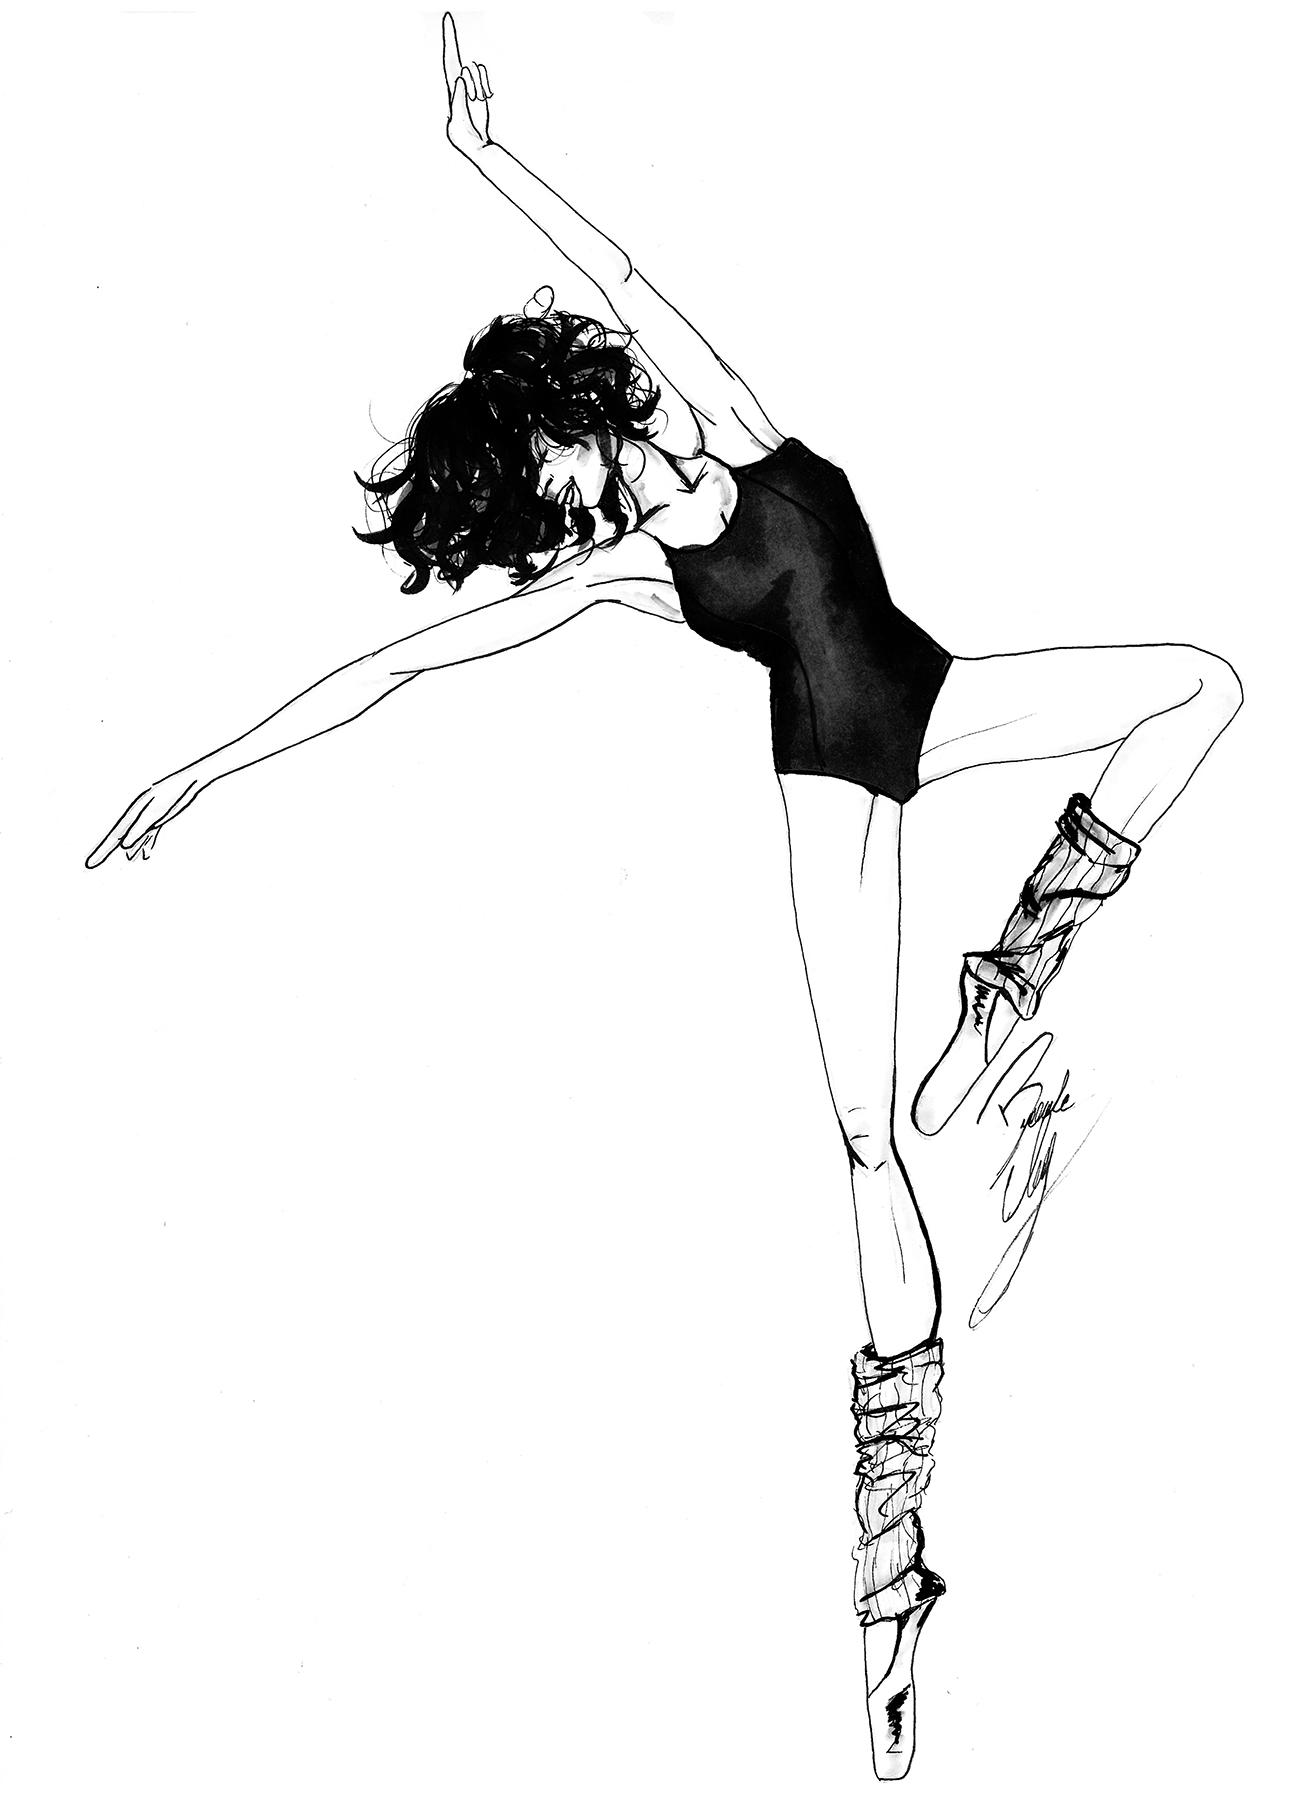 Dance bw_BAC Art Studio 2in. version 2.jpg